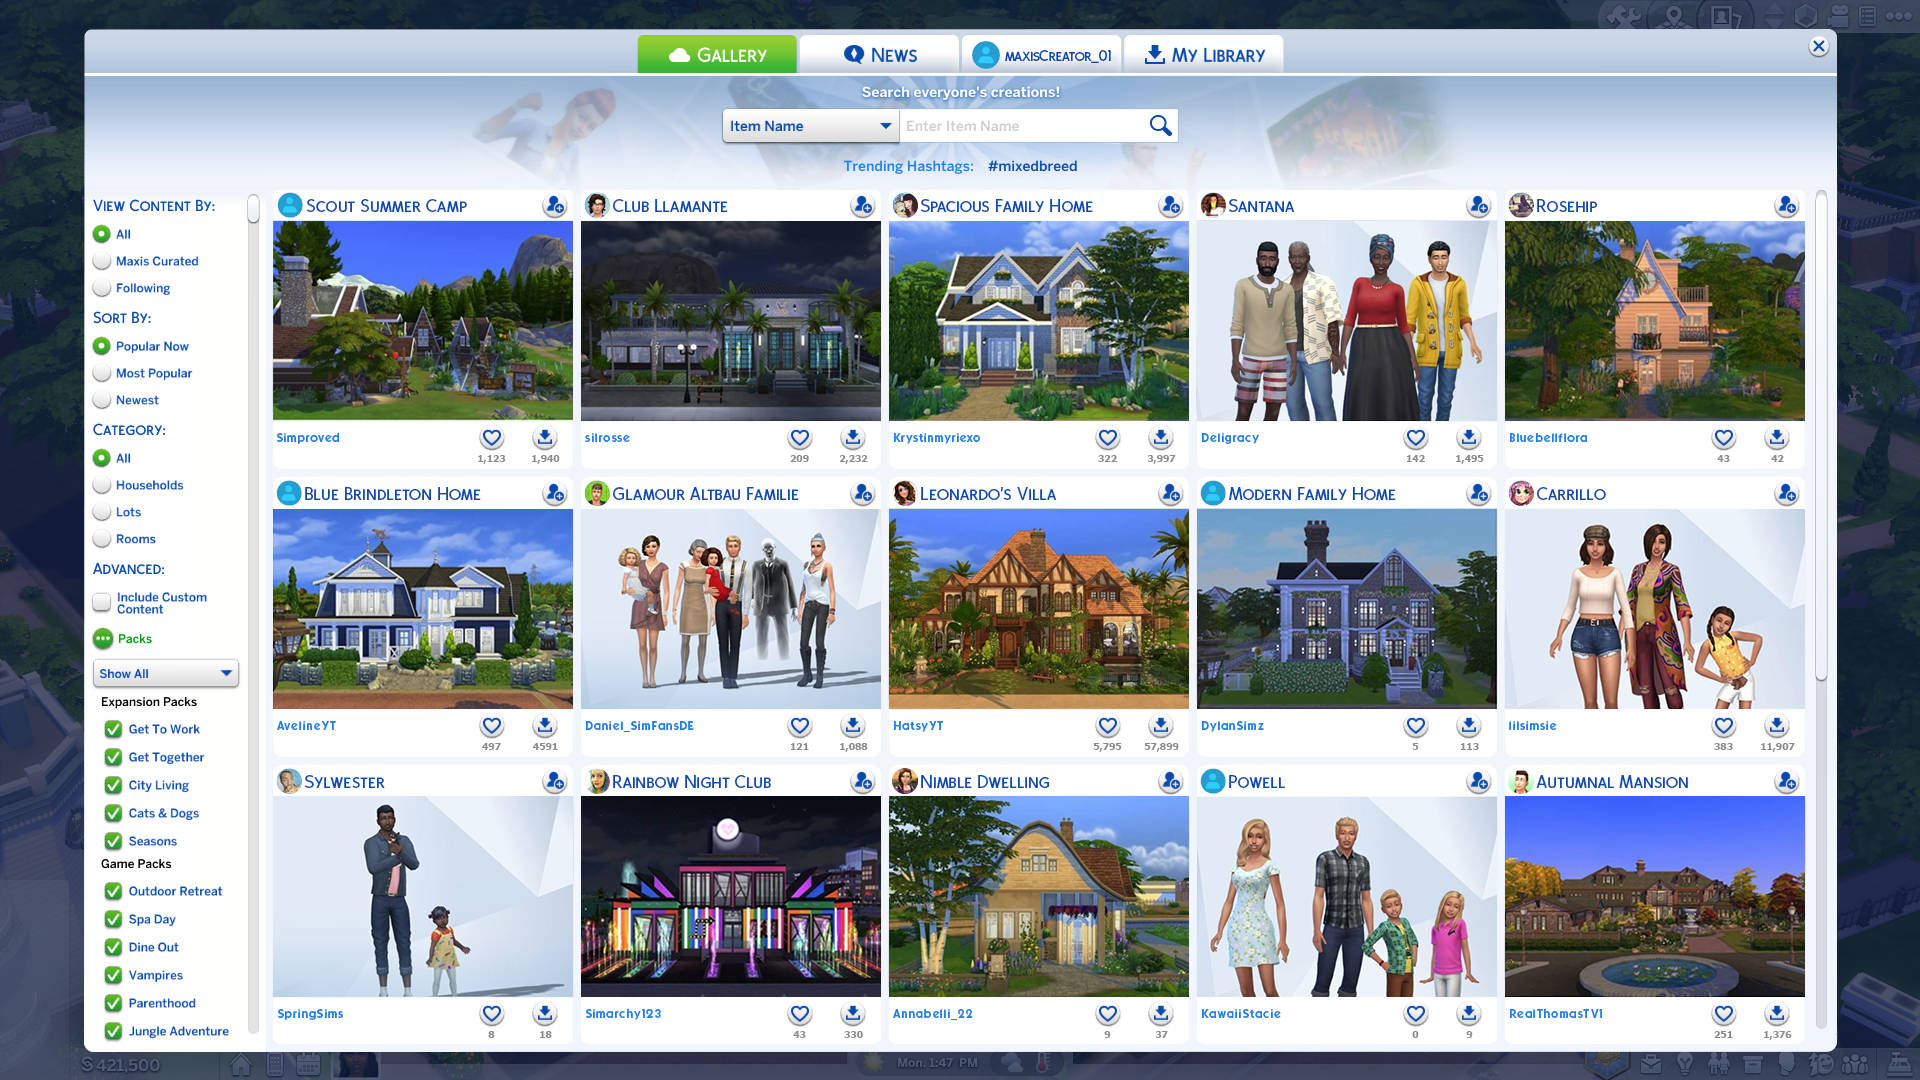 De Sims 4 Galerij update juli 2018